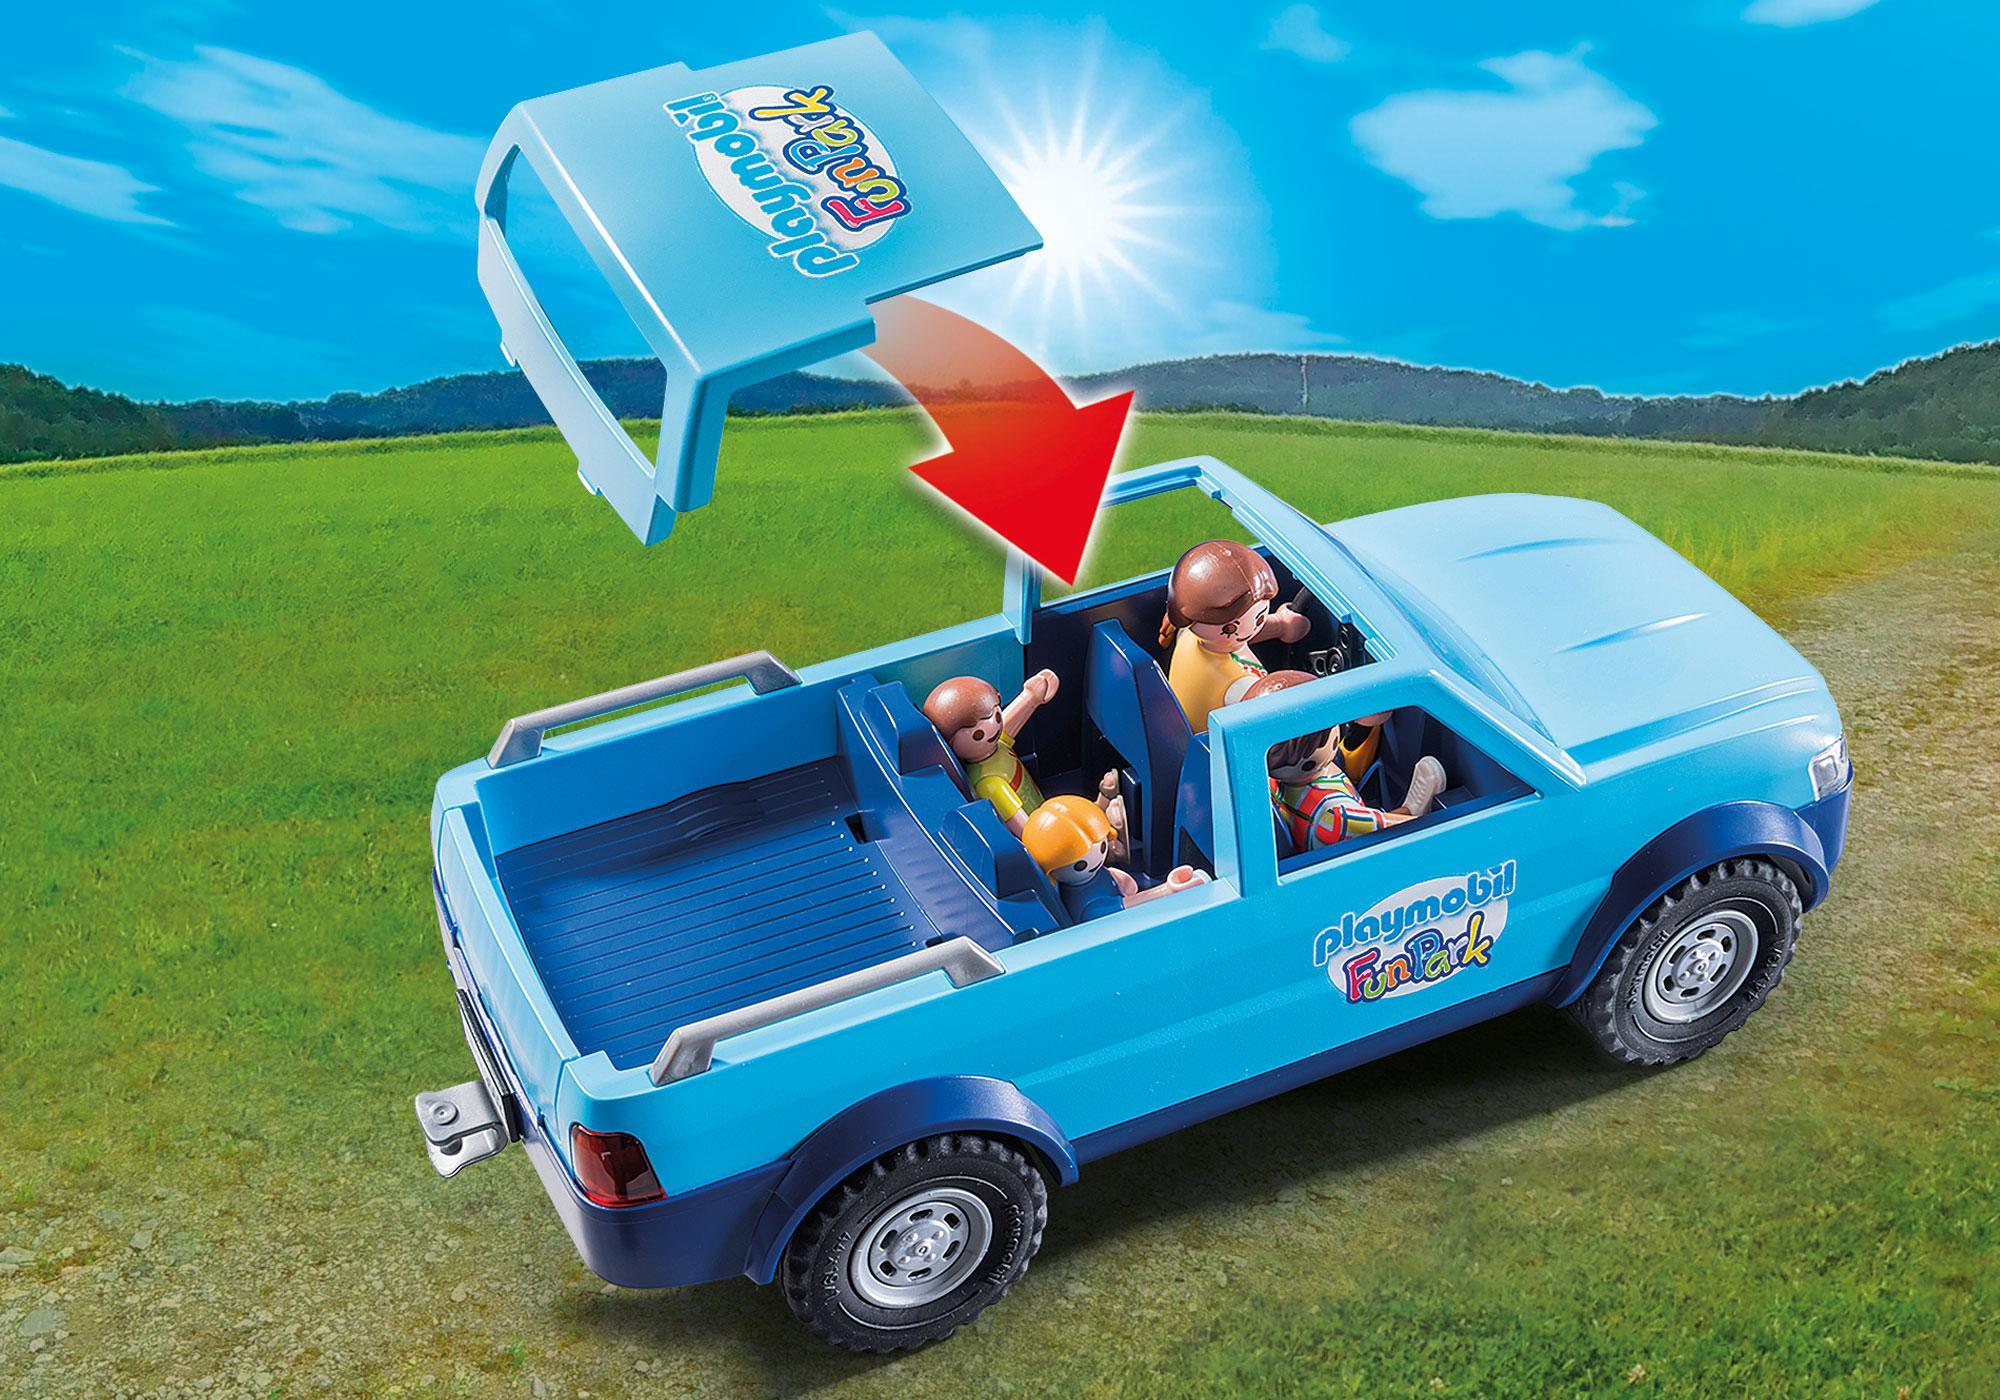 http://media.playmobil.com/i/playmobil/9502_product_extra1/PLAYMOBIL-FunPark Pickup med husvagn